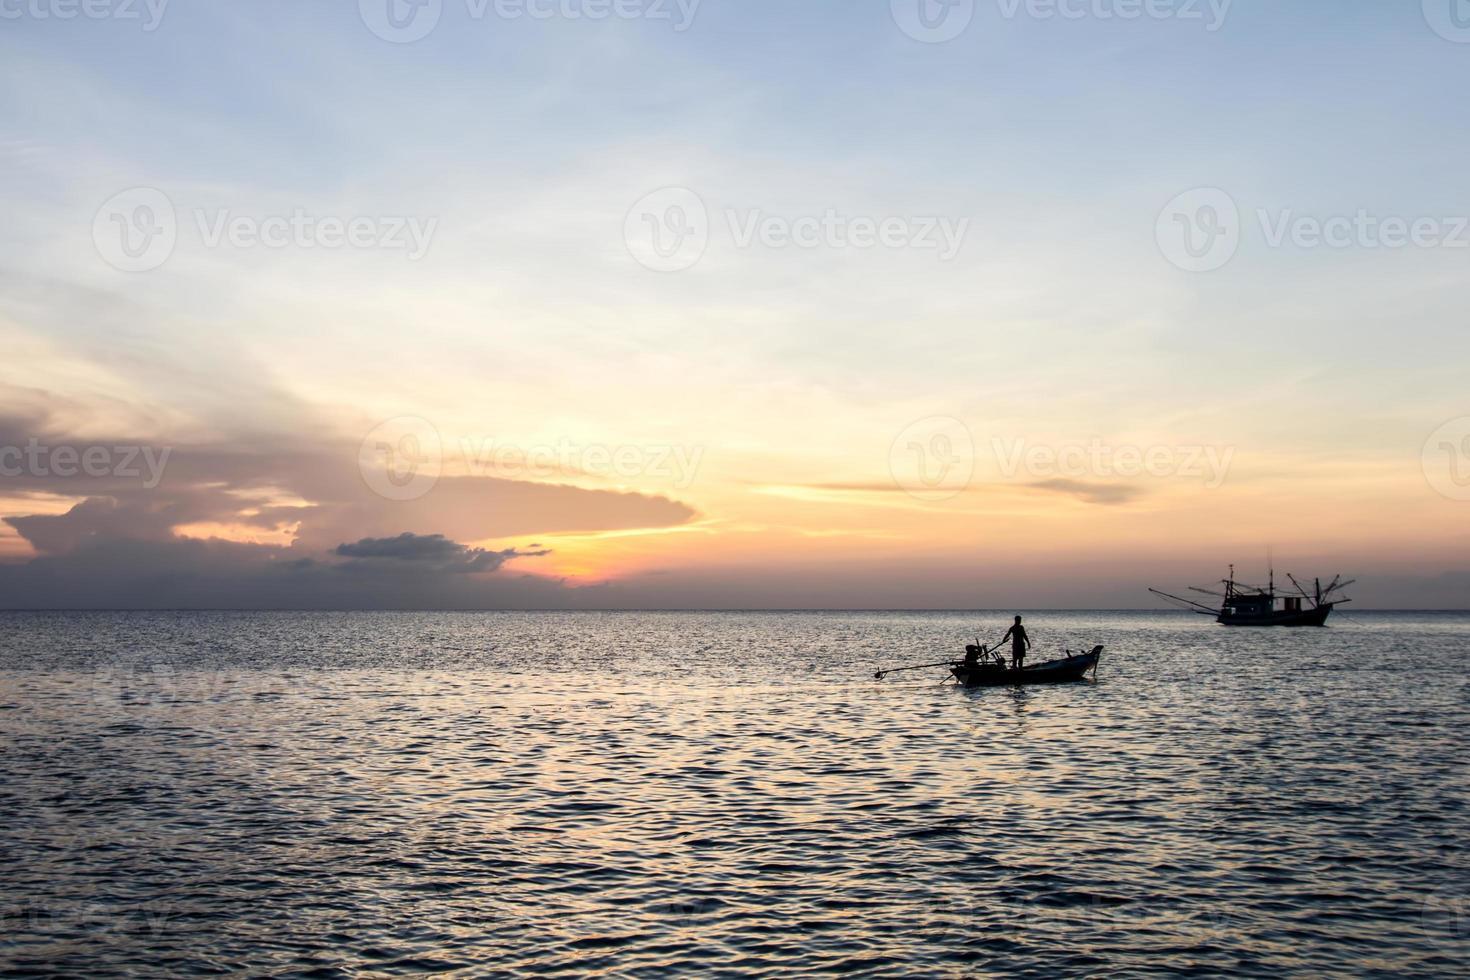 Langschwanzboot und Sonnenuntergang auf See, Koh Phangan, Surat Thani foto